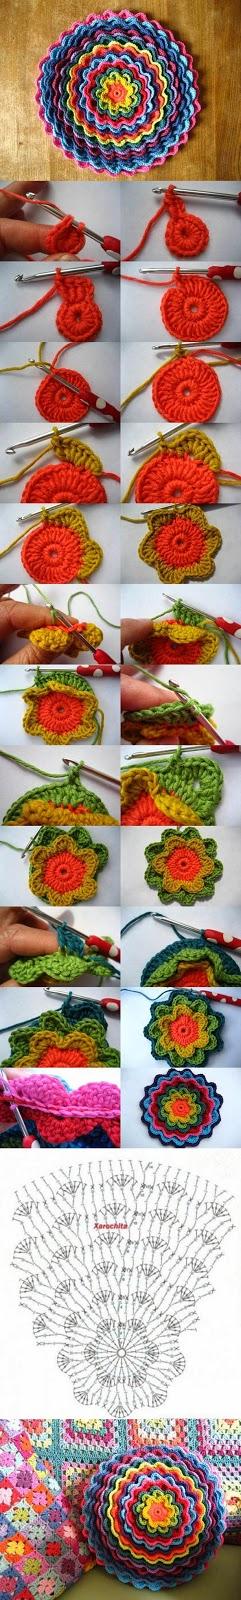 DIY Cojín Flor Floreciente